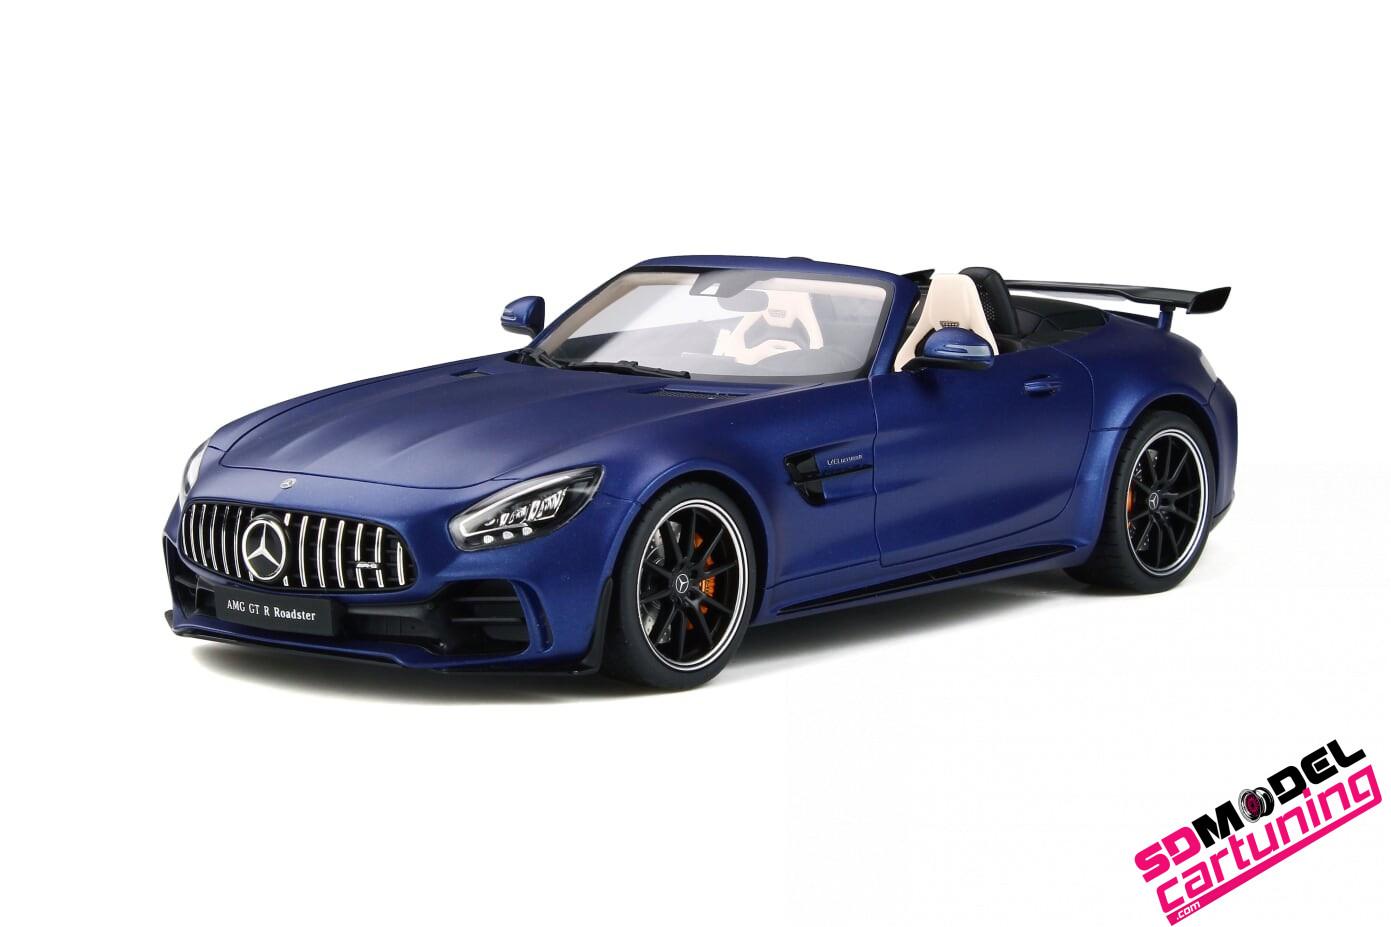 1:18 Mercedes AMG GT-R Roadster